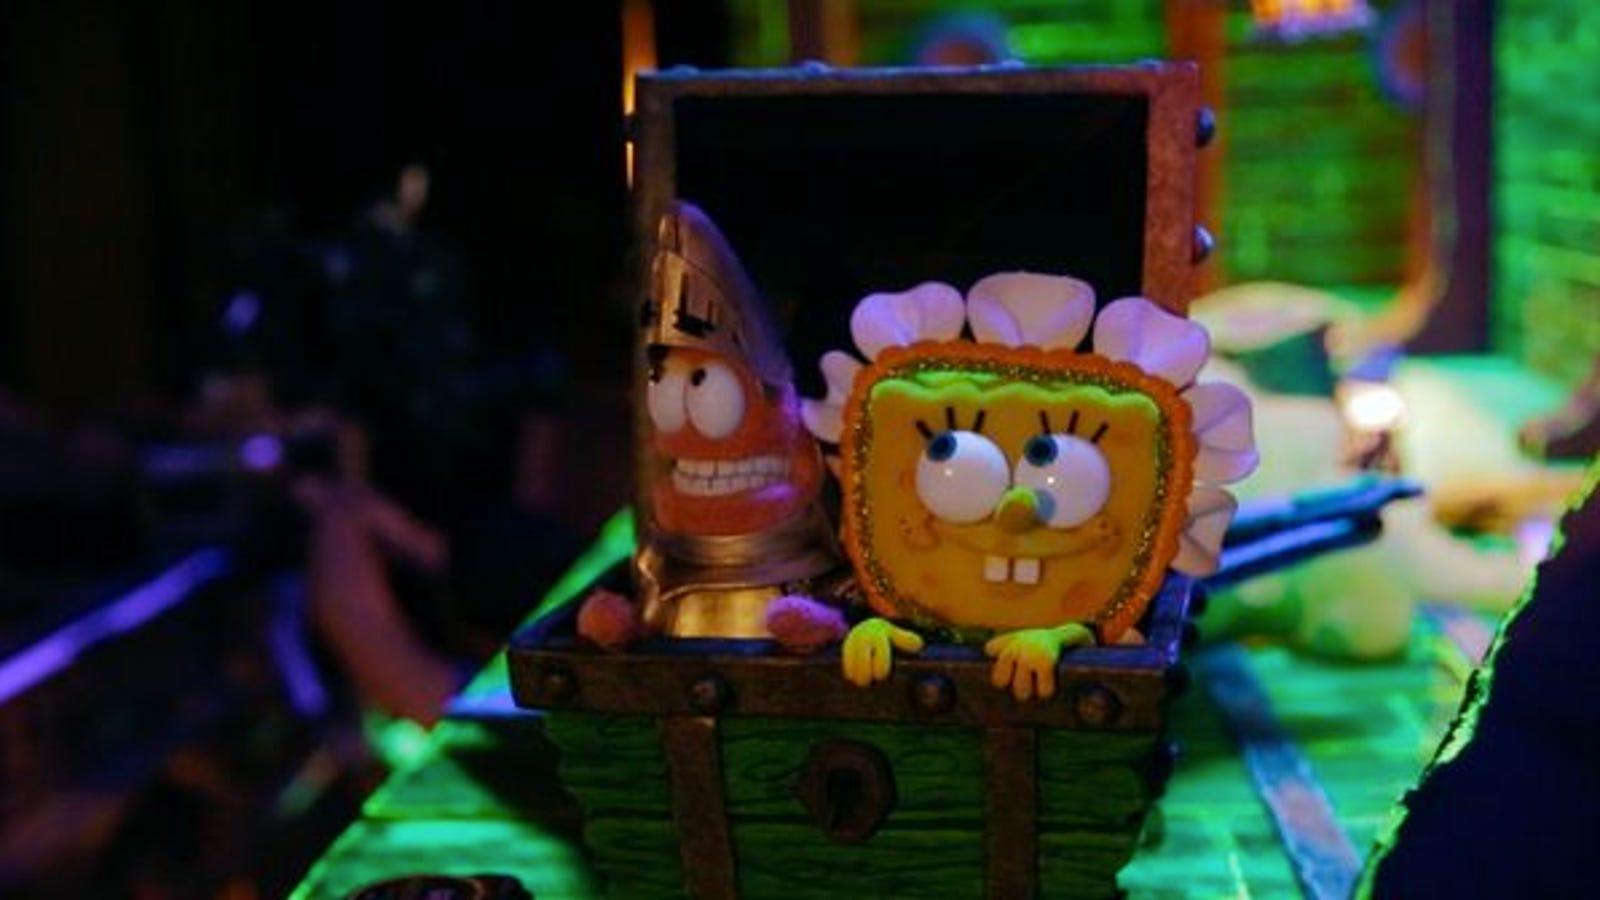 behind the scenes of spongebob squarepants' stop-motion halloween